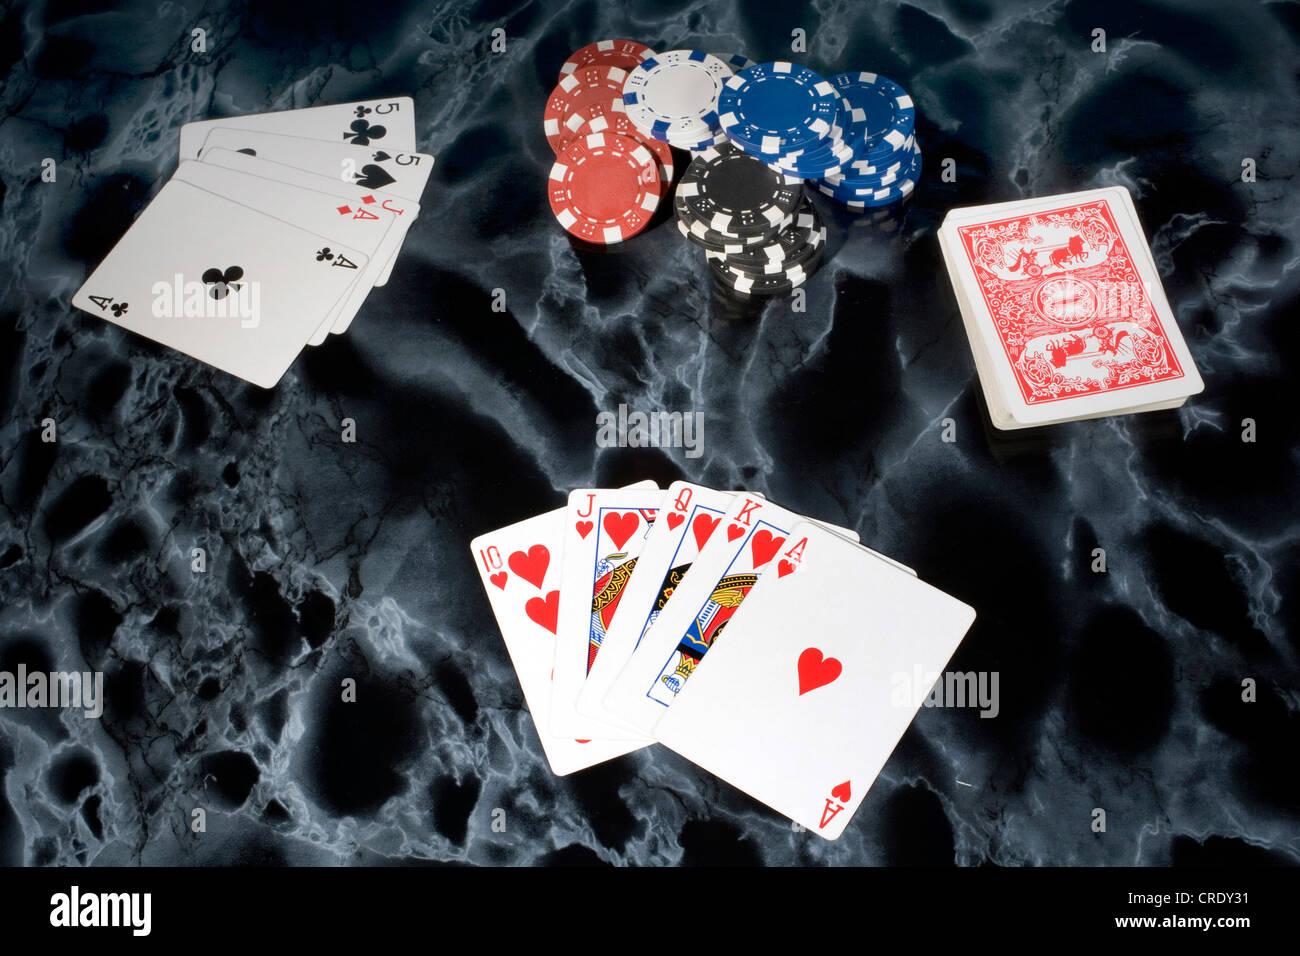 card game, poker - Stock Image